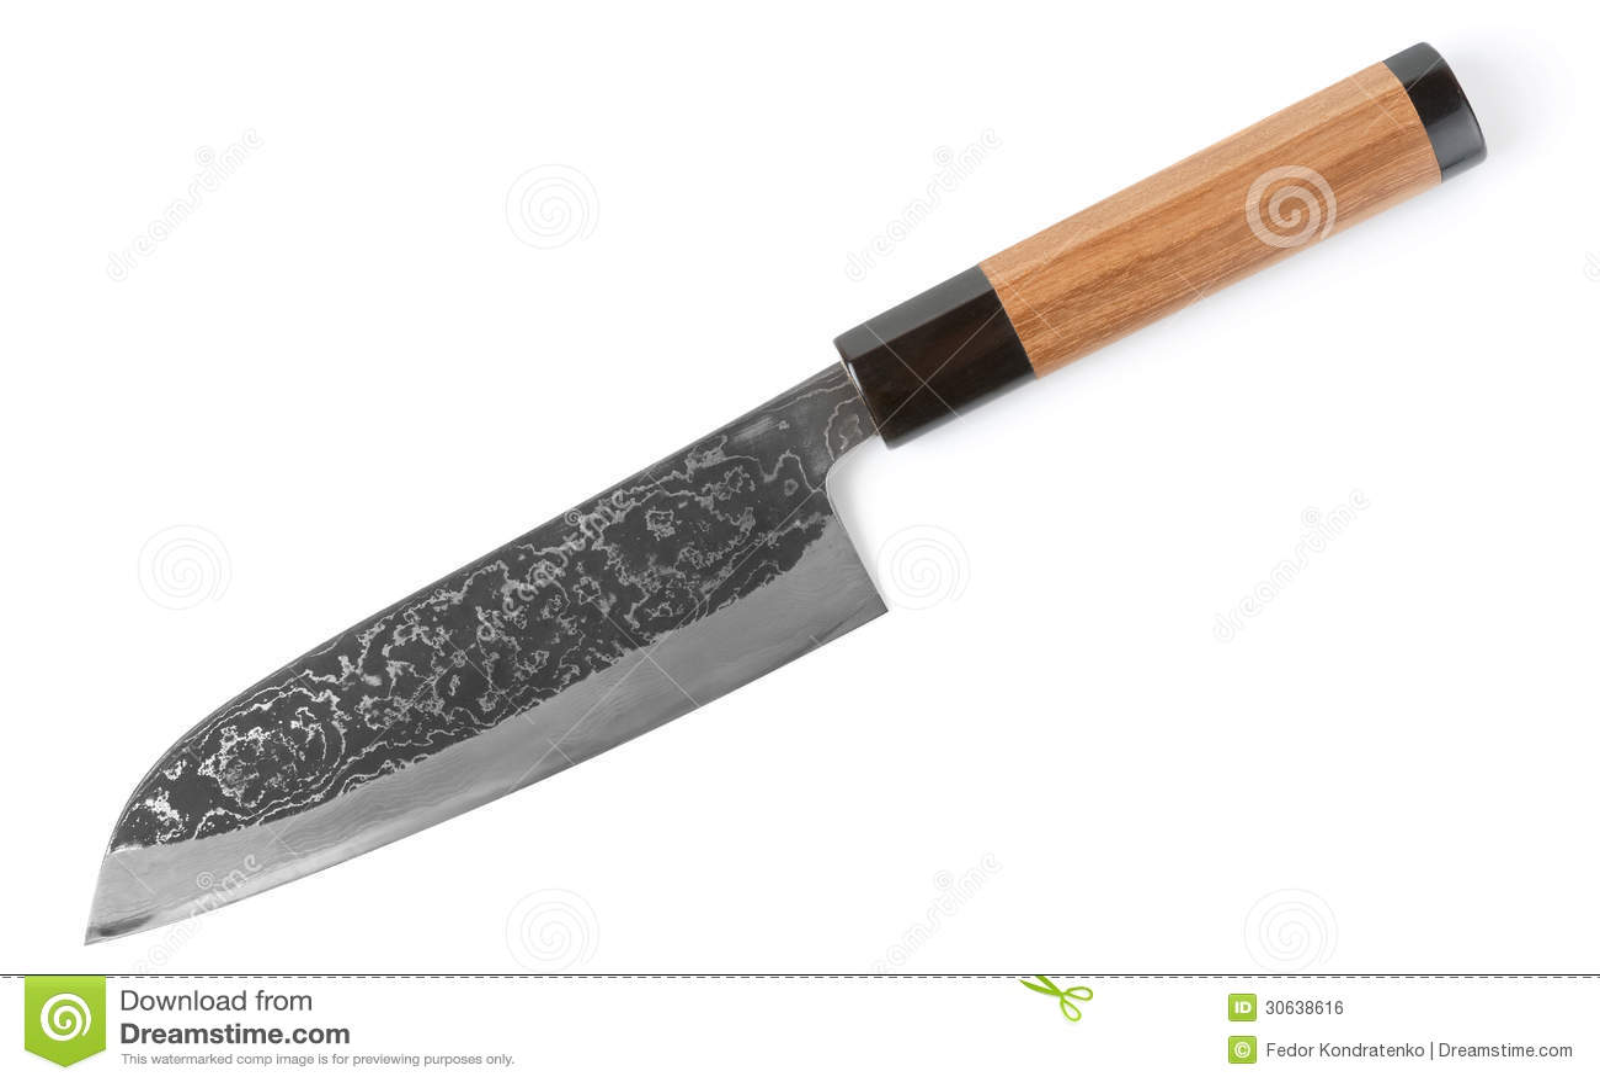 expensive carbon steel japanese knife stock photo image 30638616. Black Bedroom Furniture Sets. Home Design Ideas